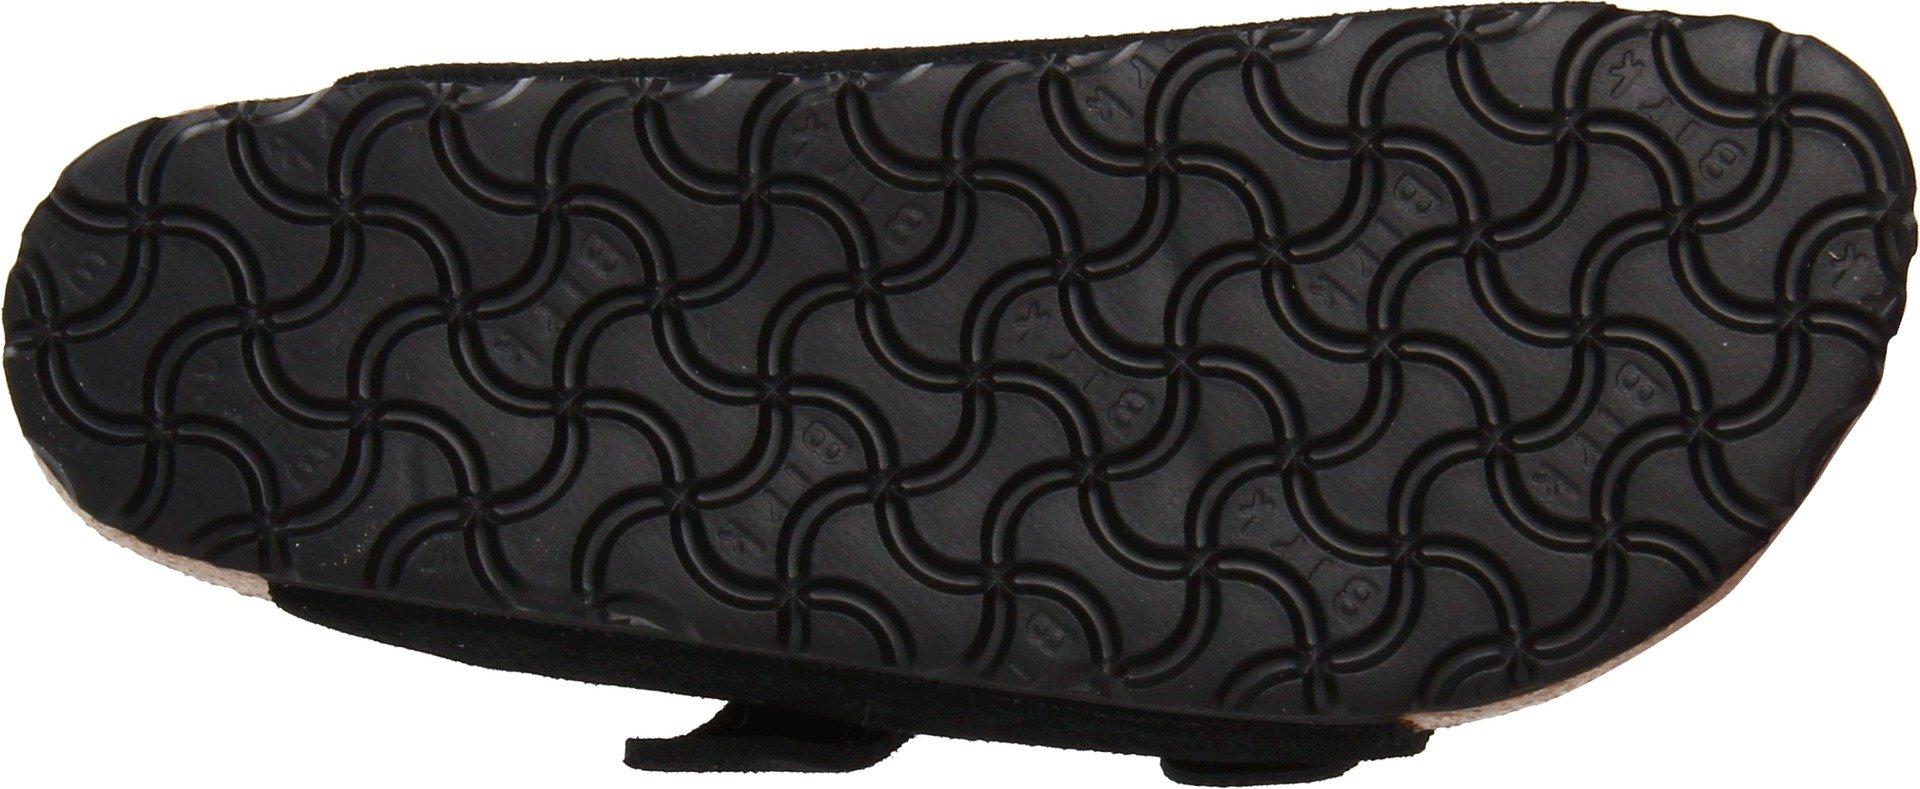 Birkenstock Arizona Soft Footbed Black Suede Regular Width - EU Size 35 / Women's US Sizes 4-4.5 by Birkenstock (Image #3)